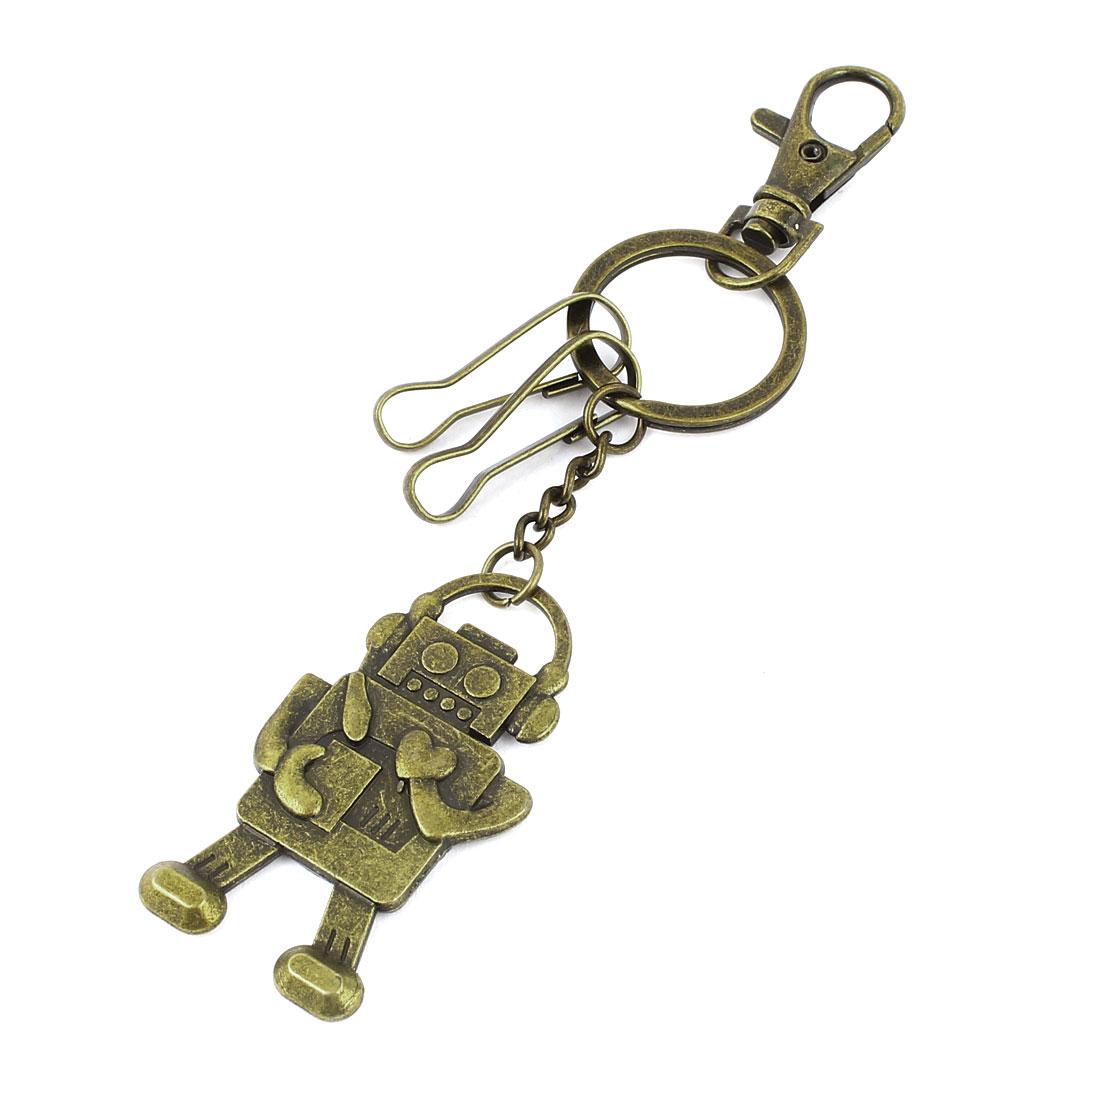 Bronze Tone Robot Design Pendant Lobster Clasp Metal Split Ring Keychain Keyring Decor